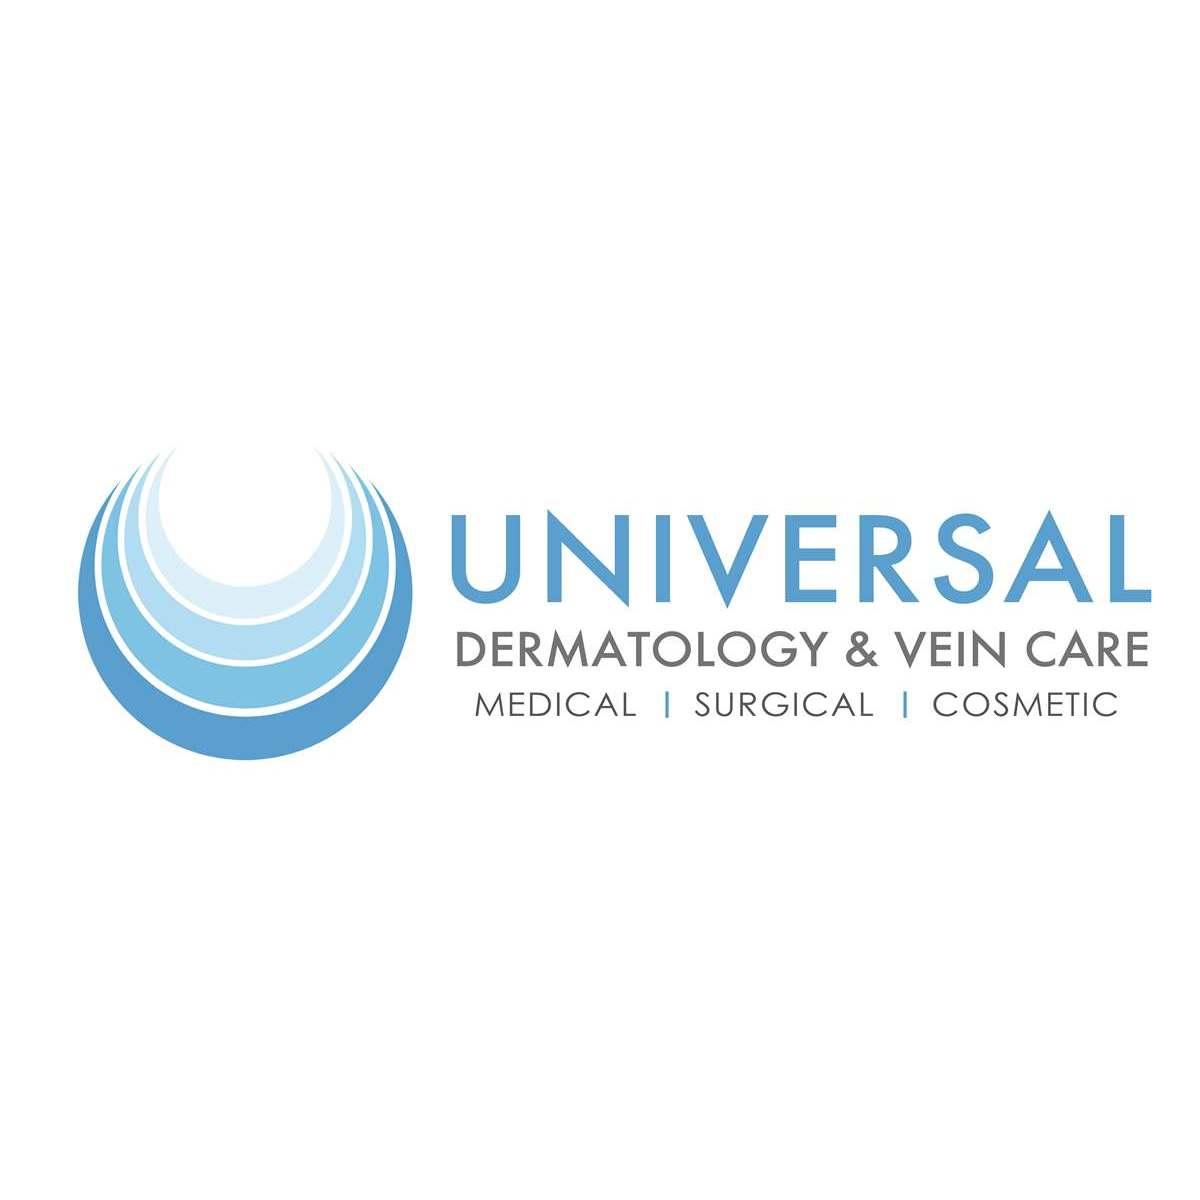 Universal Dermatology & Vein Care: Dr. George Skandamis